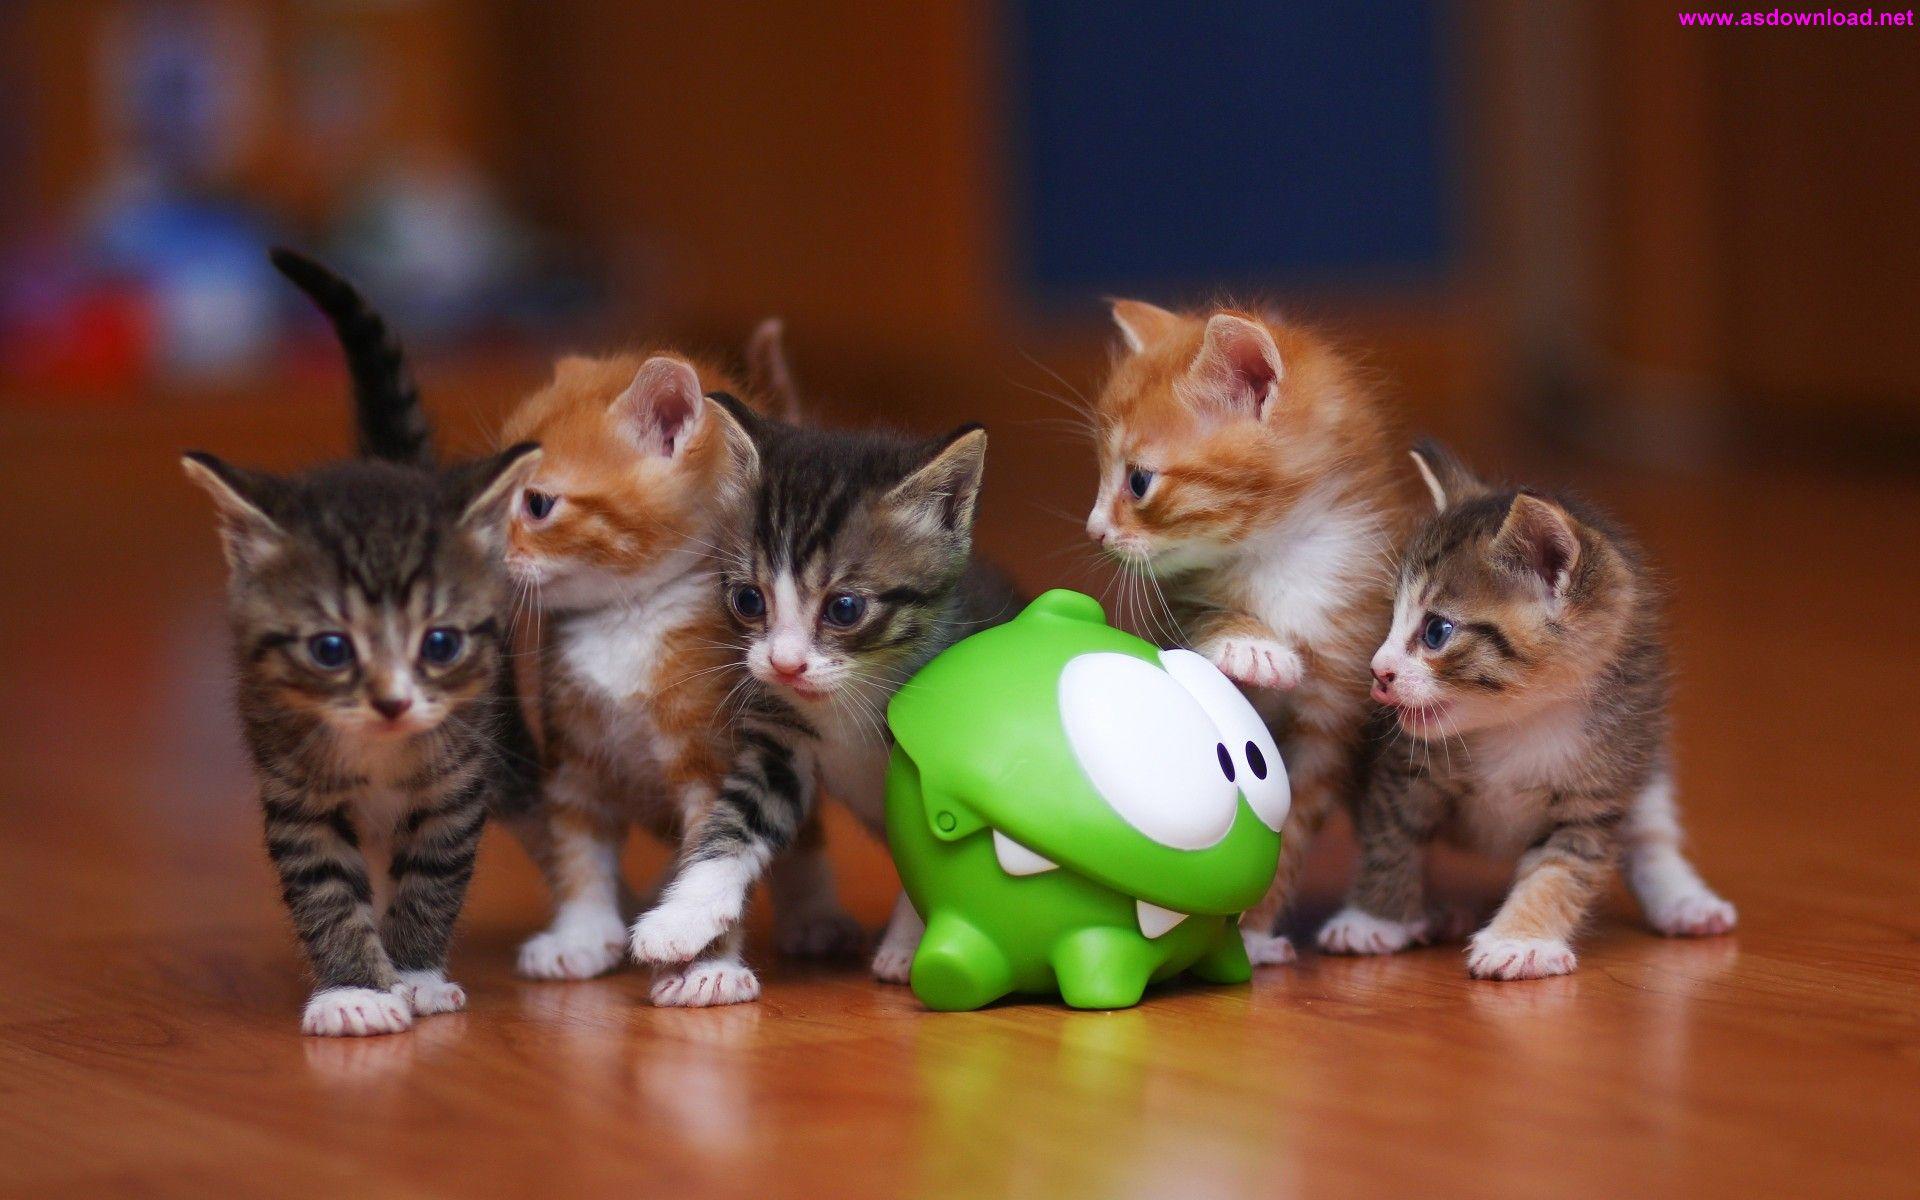 Om Nom Kittens Cat Toy Wallpaper دانلود والپیپر جدید 2015